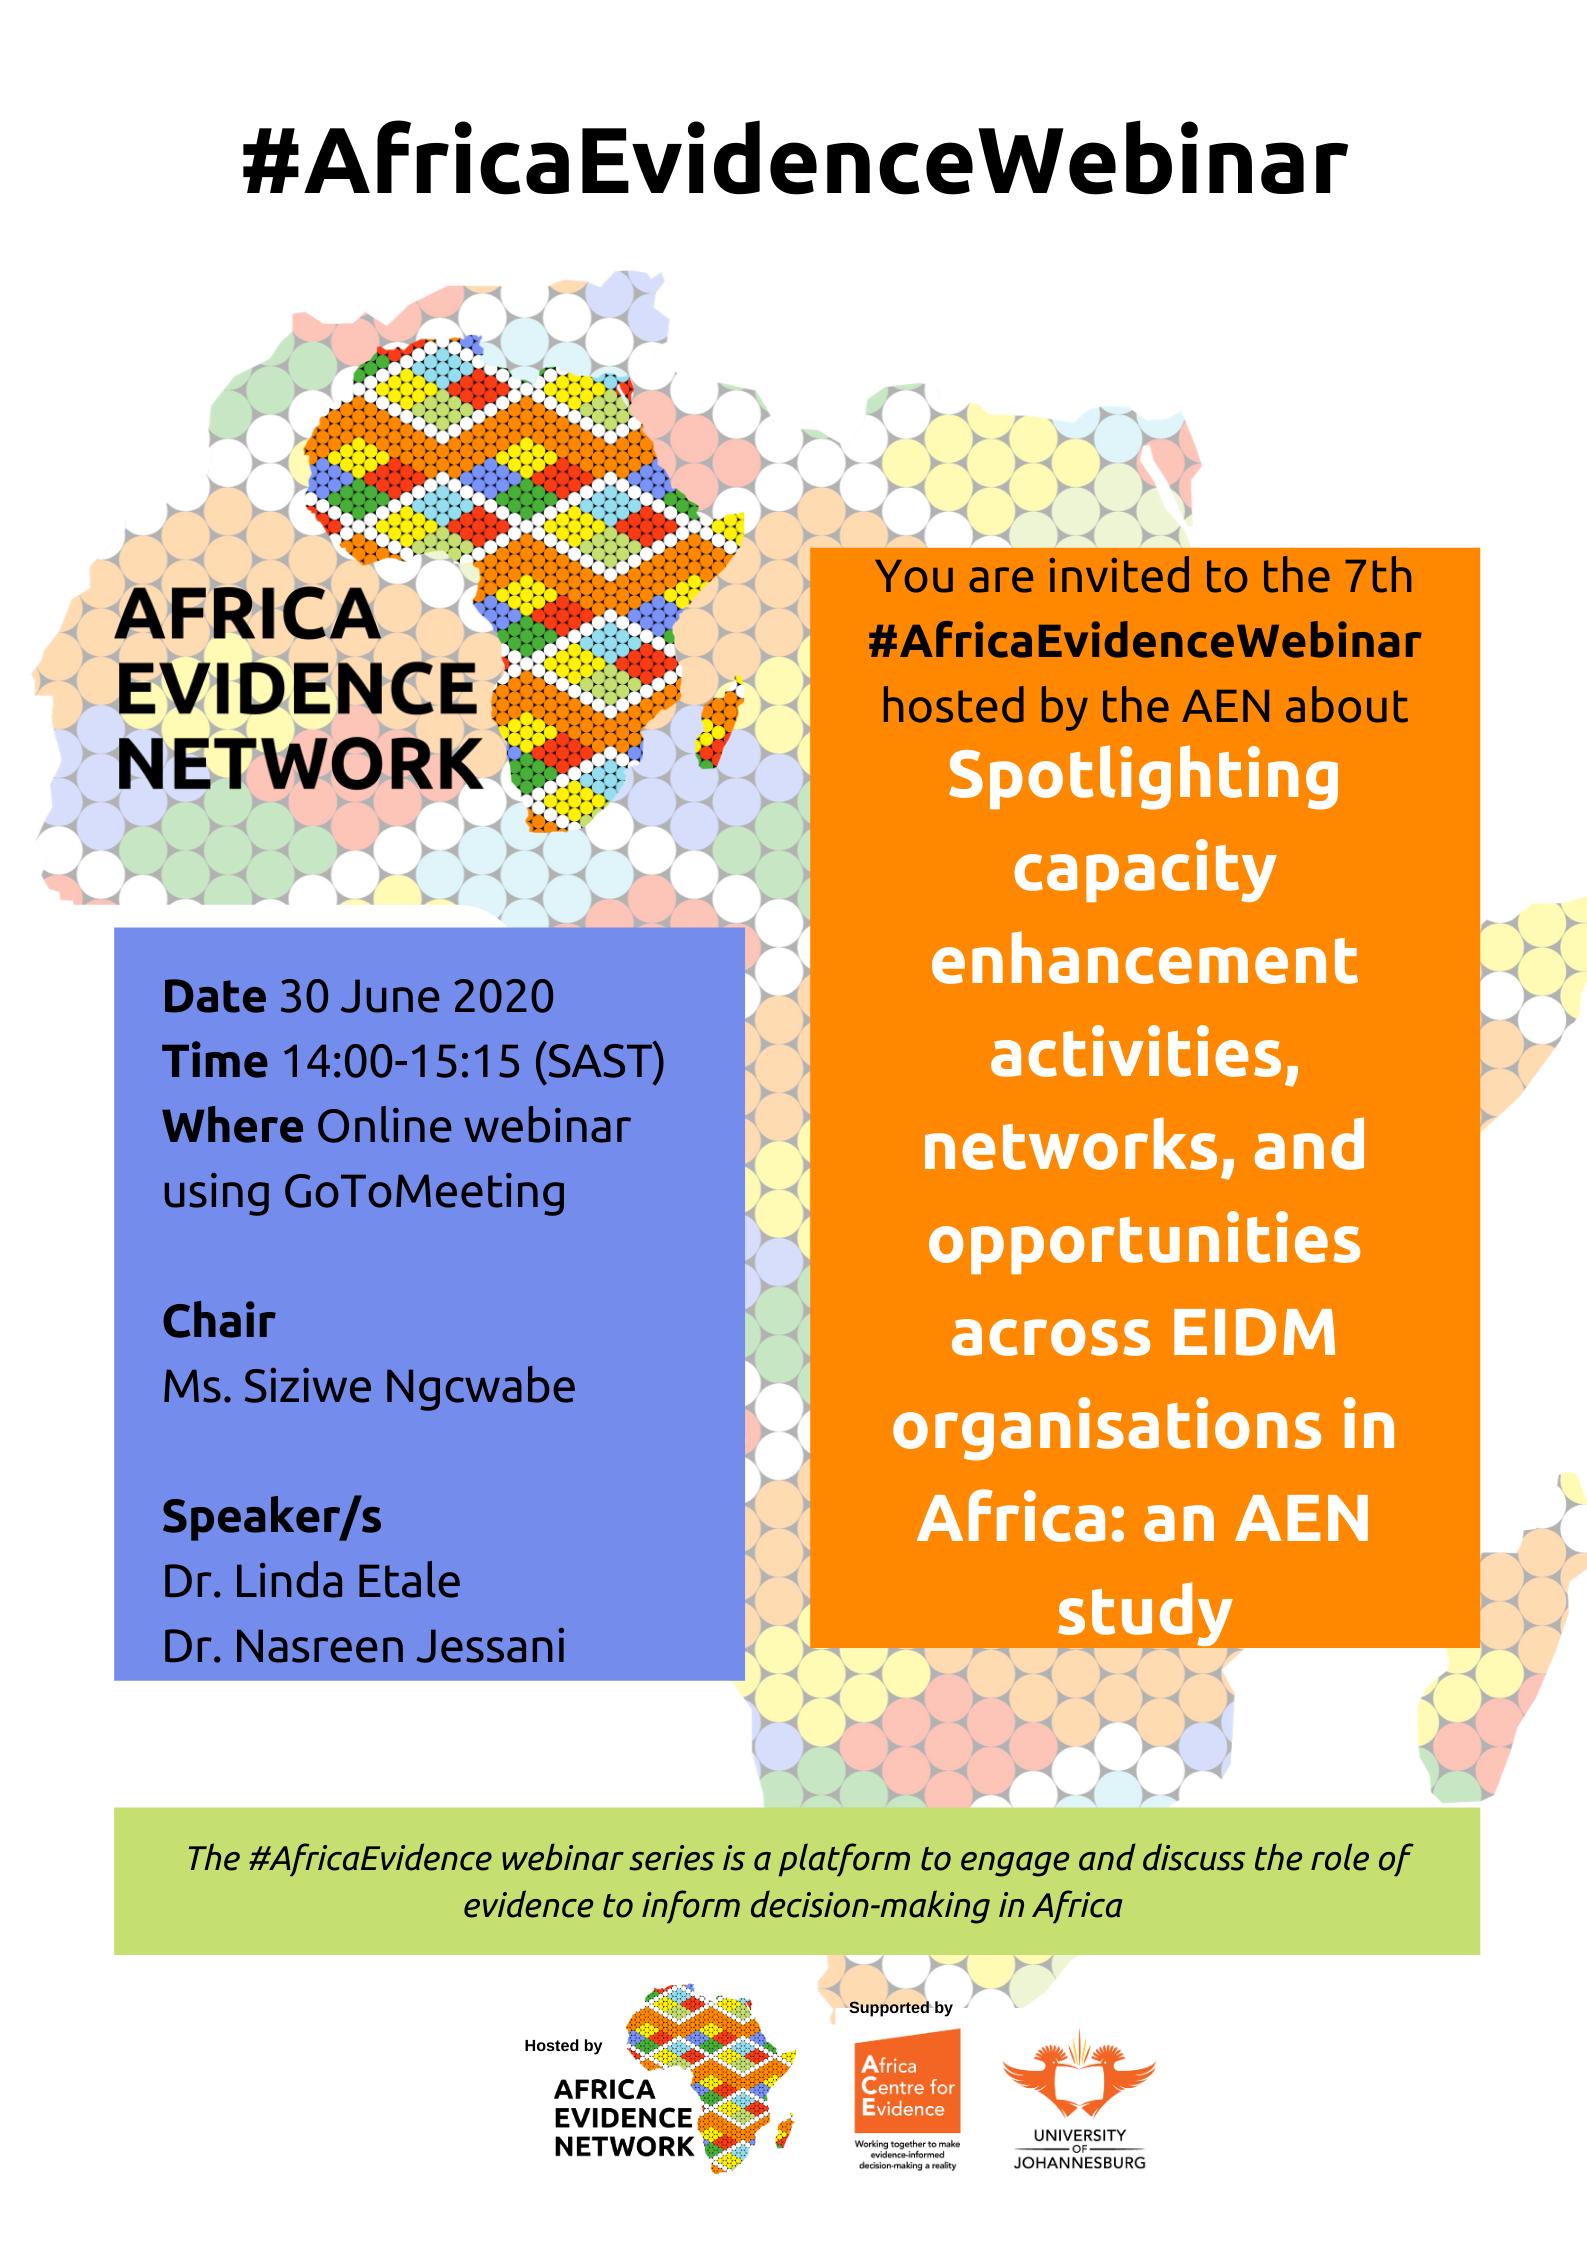 Africa Evidence Webinar #7: Spotlighting capacity enhancement activities, networks, and opportunities across EIDM organisations in Africa: an AEN study